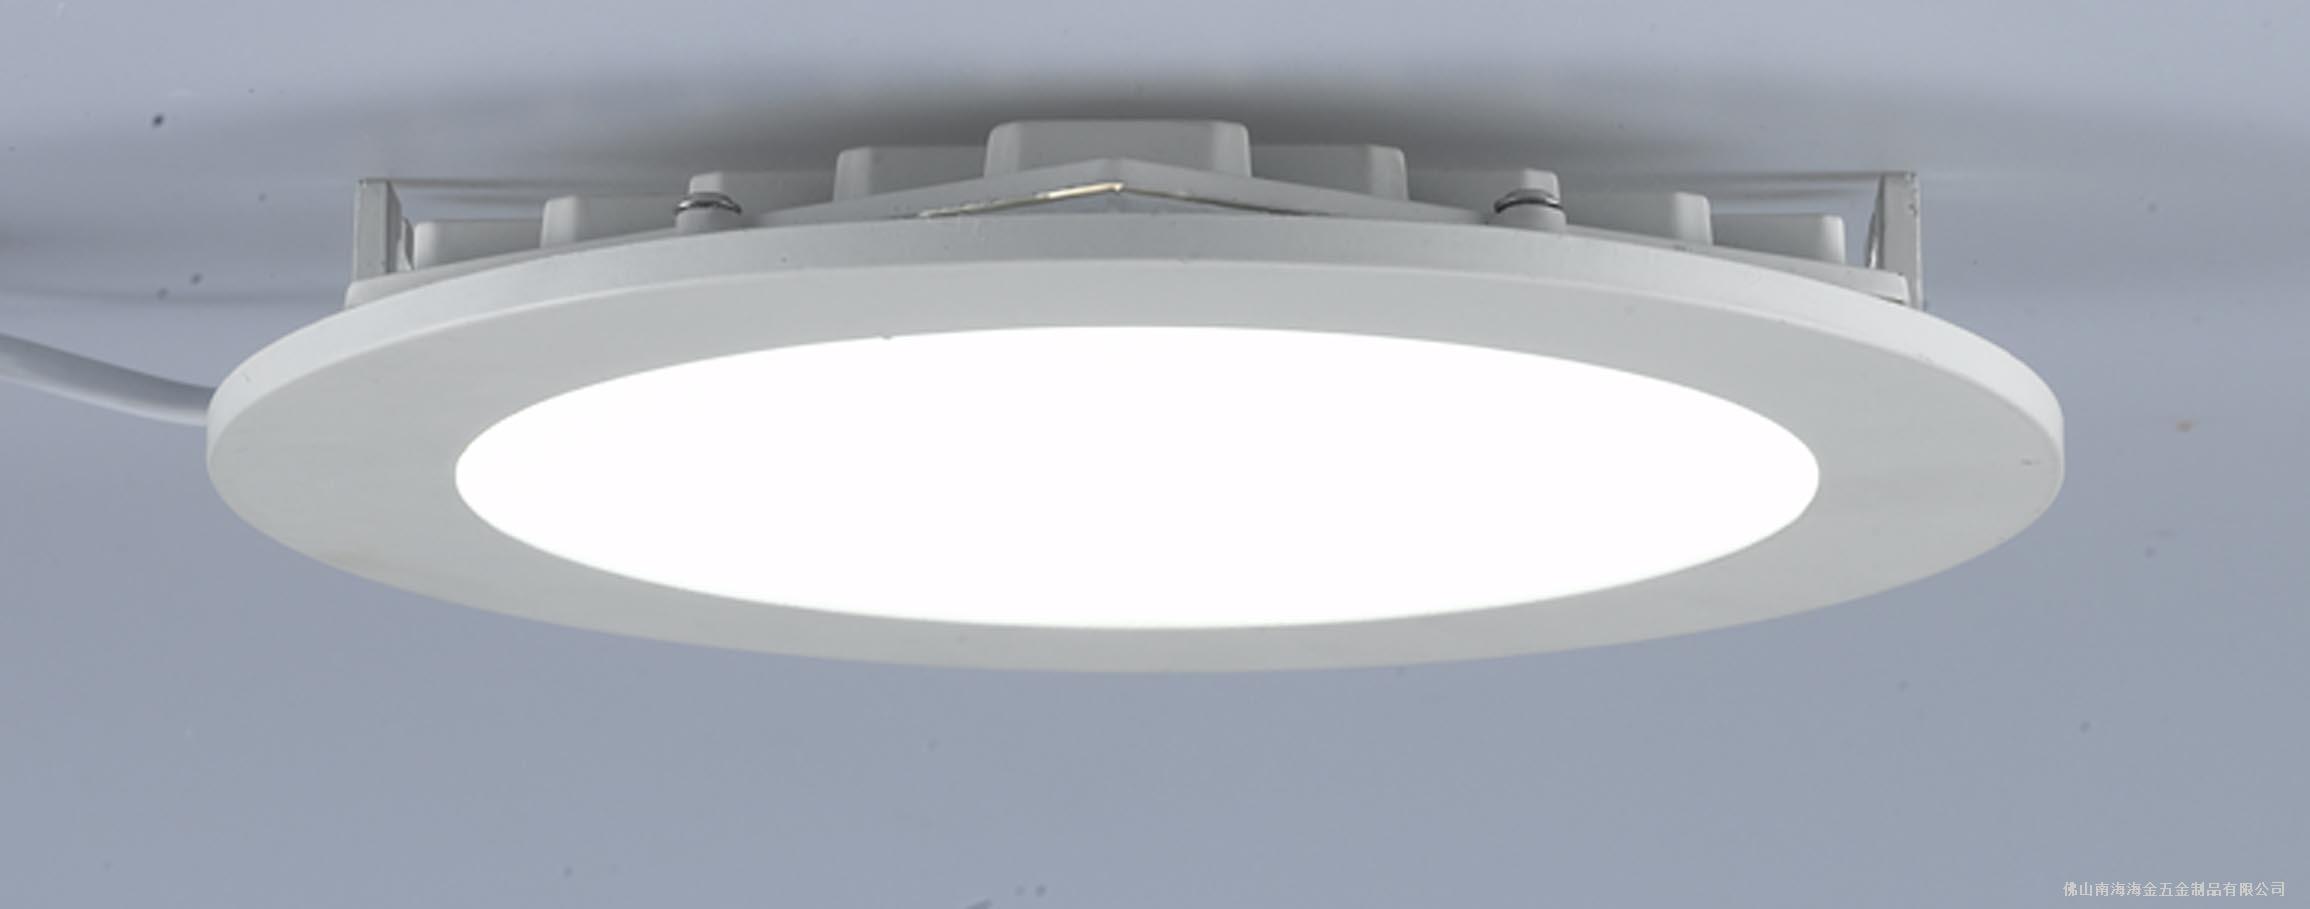 led面板灯_佛山市南海海金五金制品有限公司提供